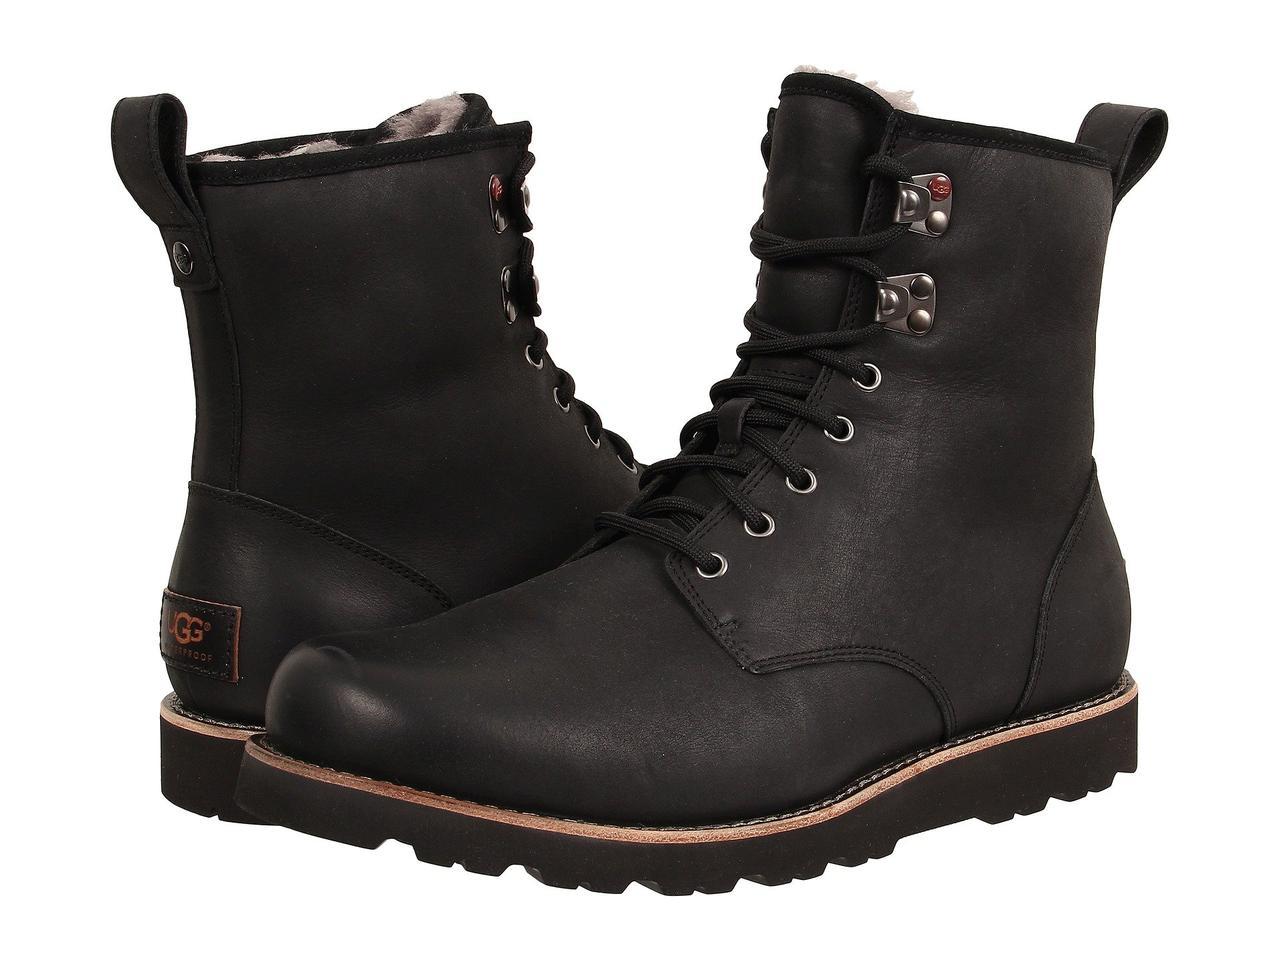 Ботинки/Сапоги (Оригинал) UGG Hannen TL Black Leather